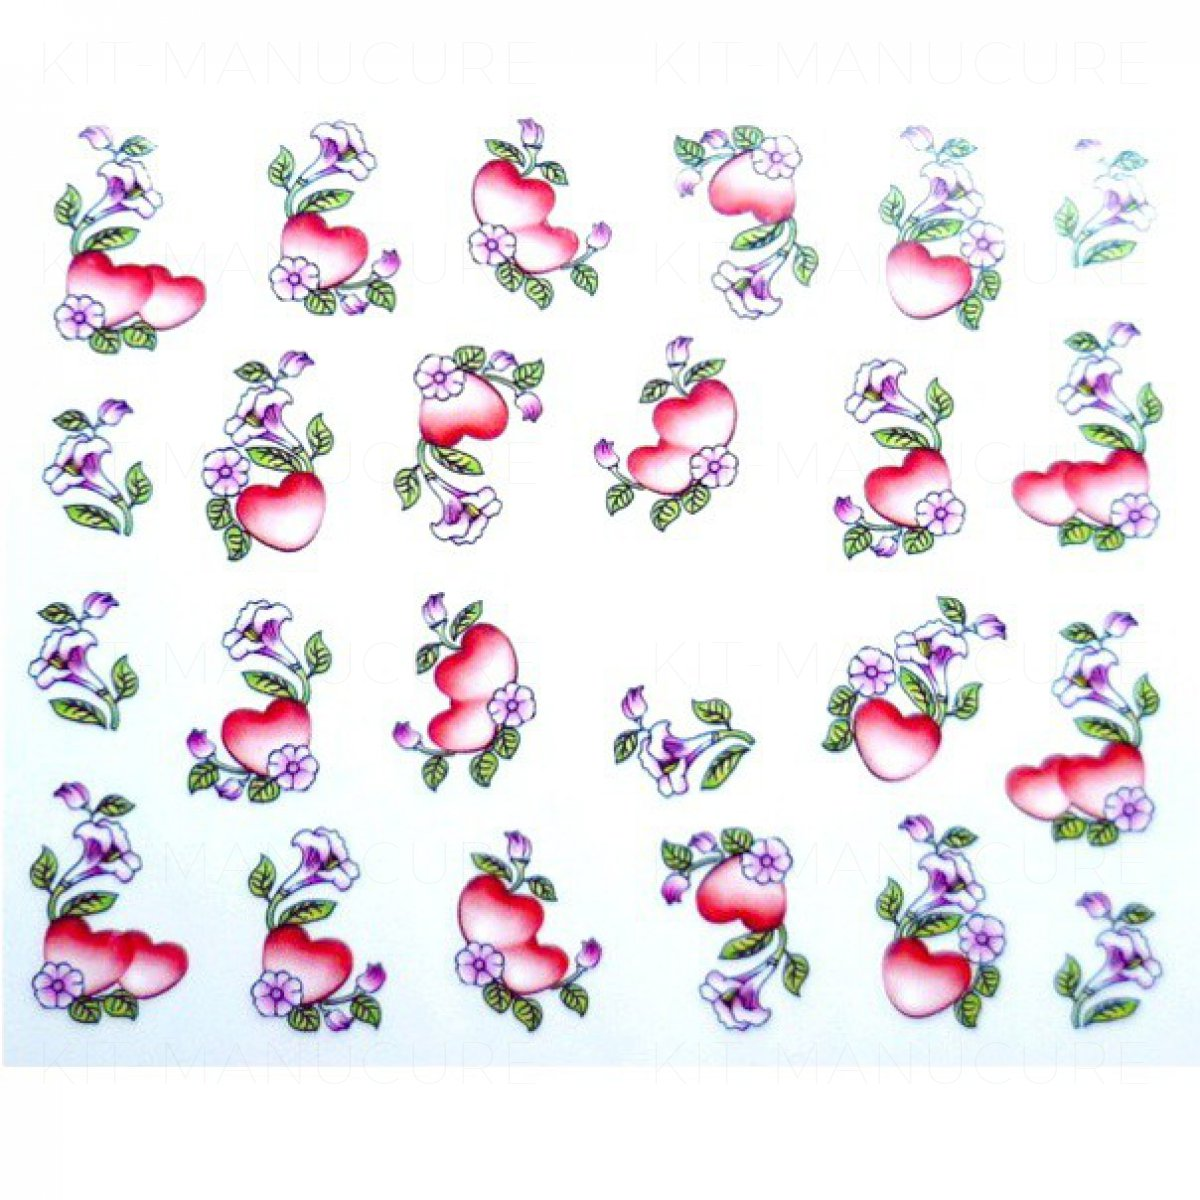 https://www.kit-manucure.com/1744-thickbox_default/water-decals-coeurs-et-fleurs.jpg